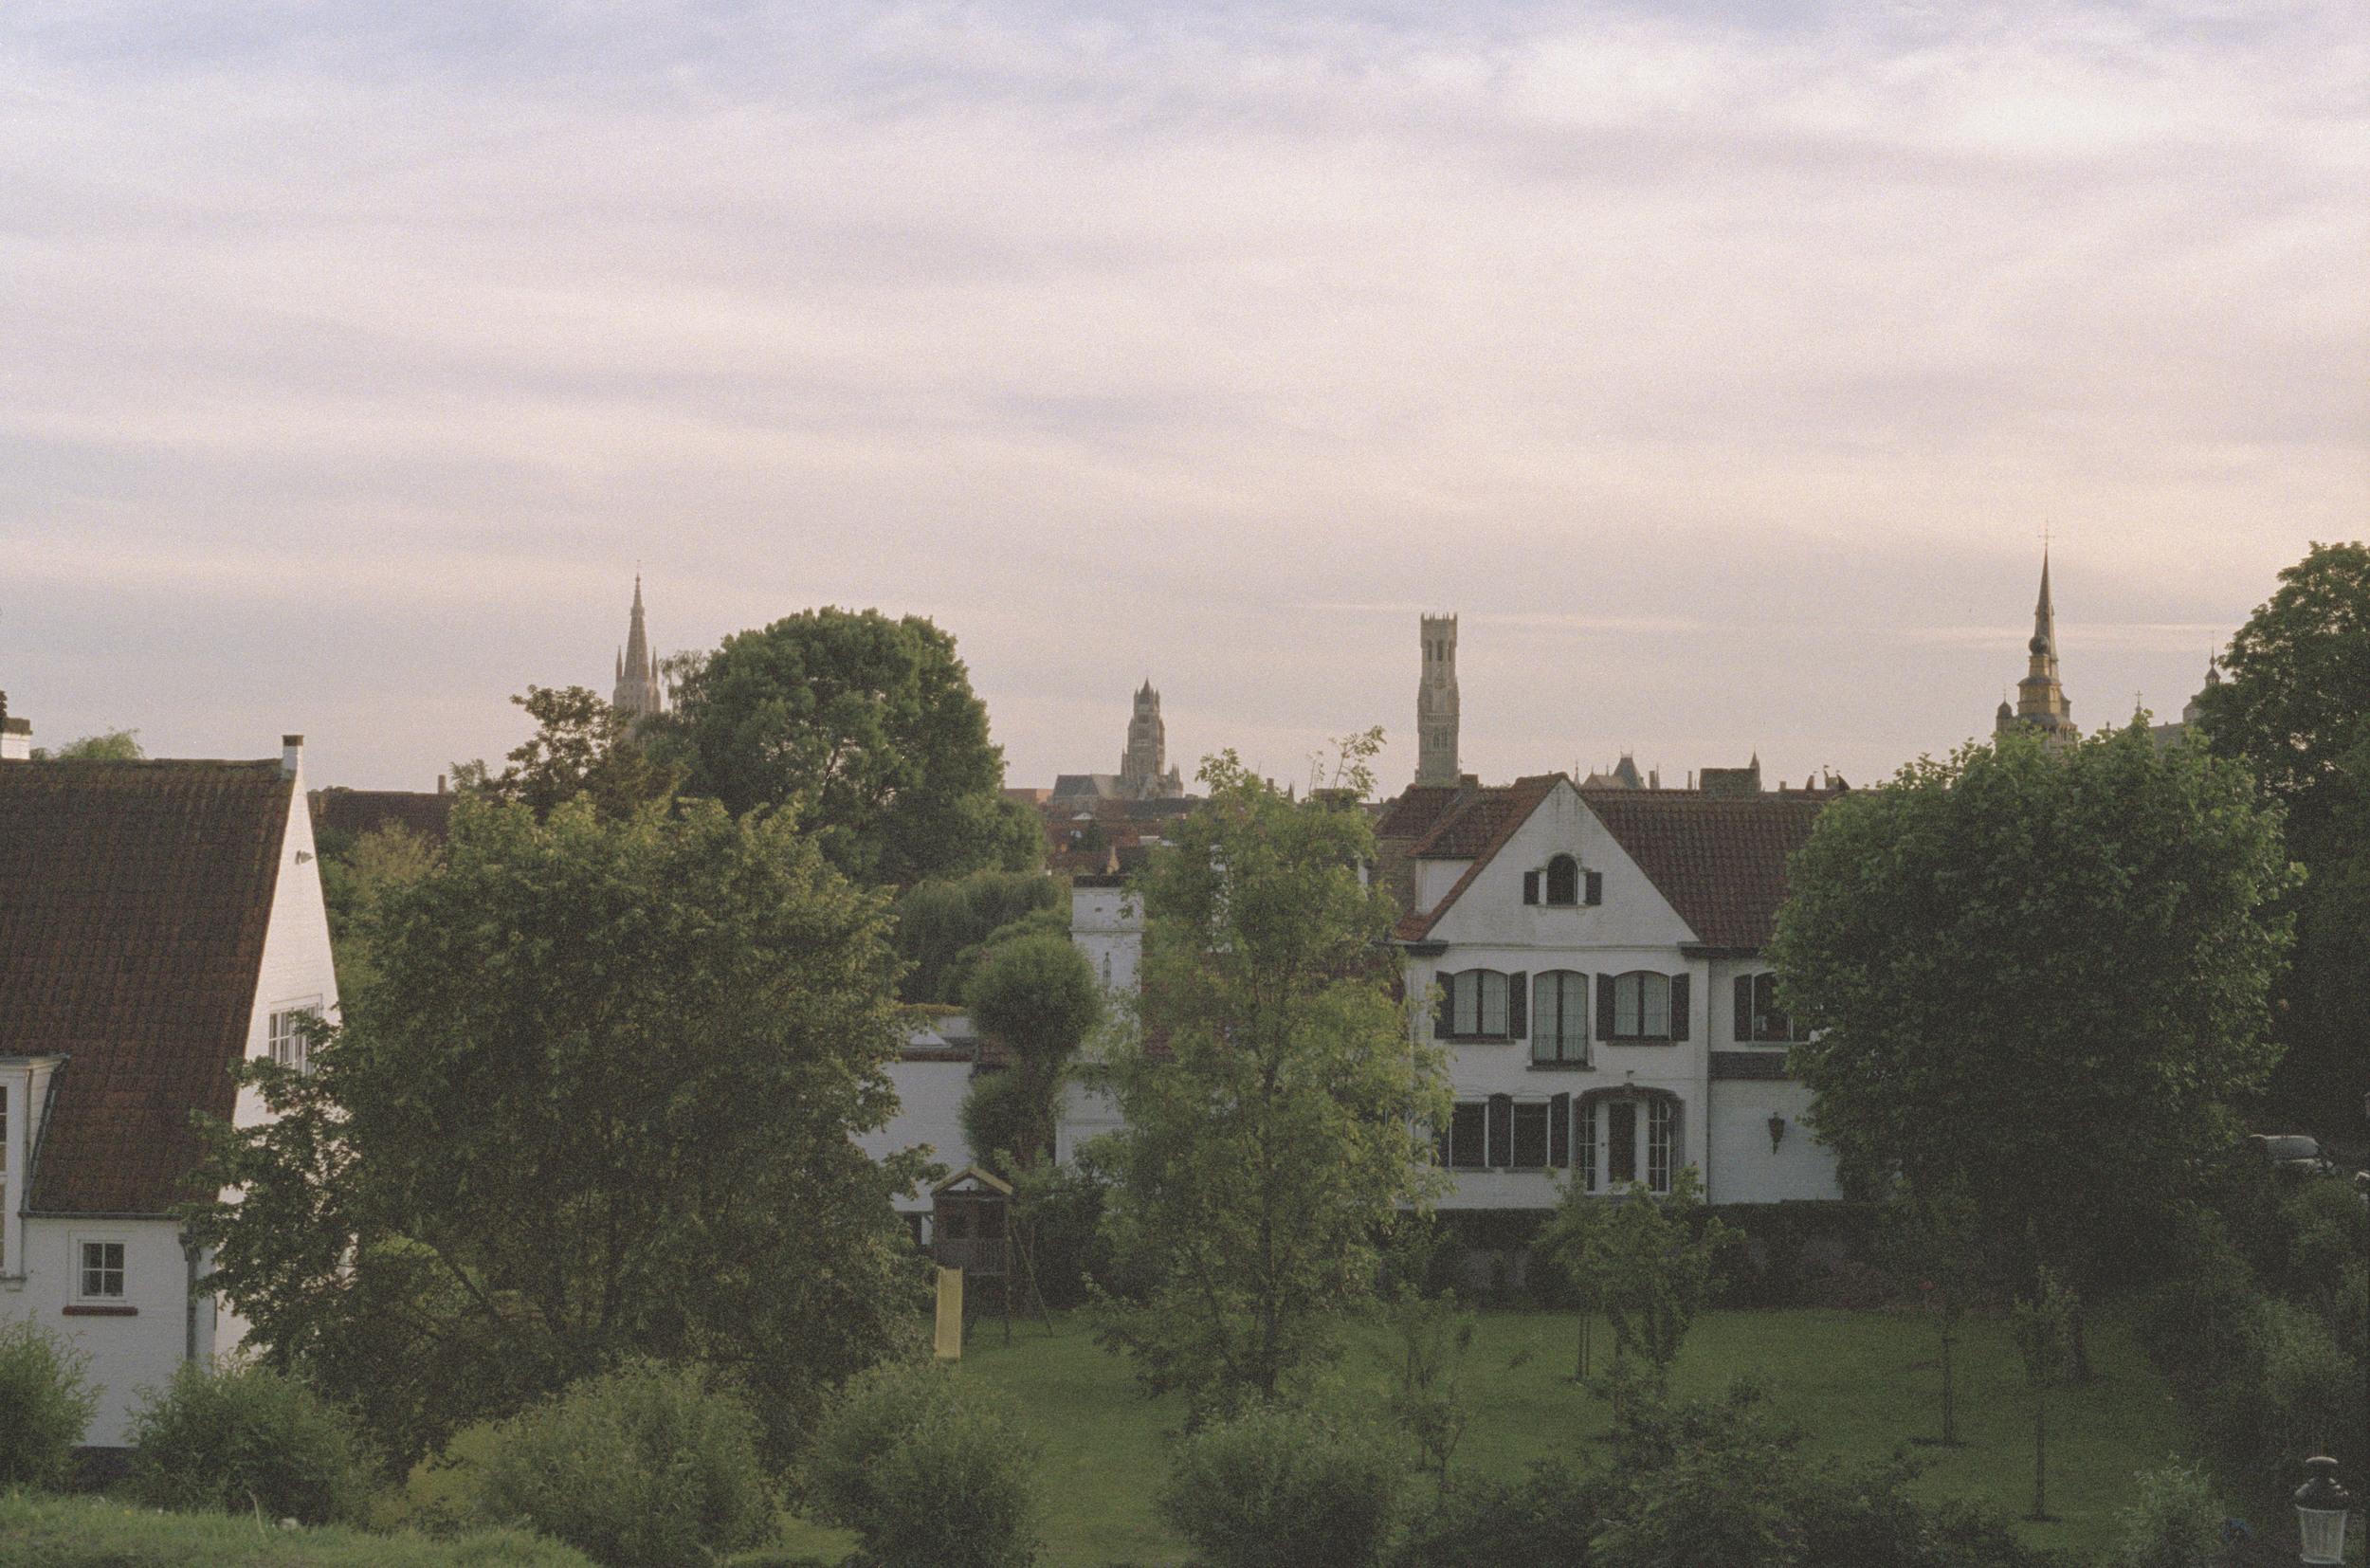 York, England  2014